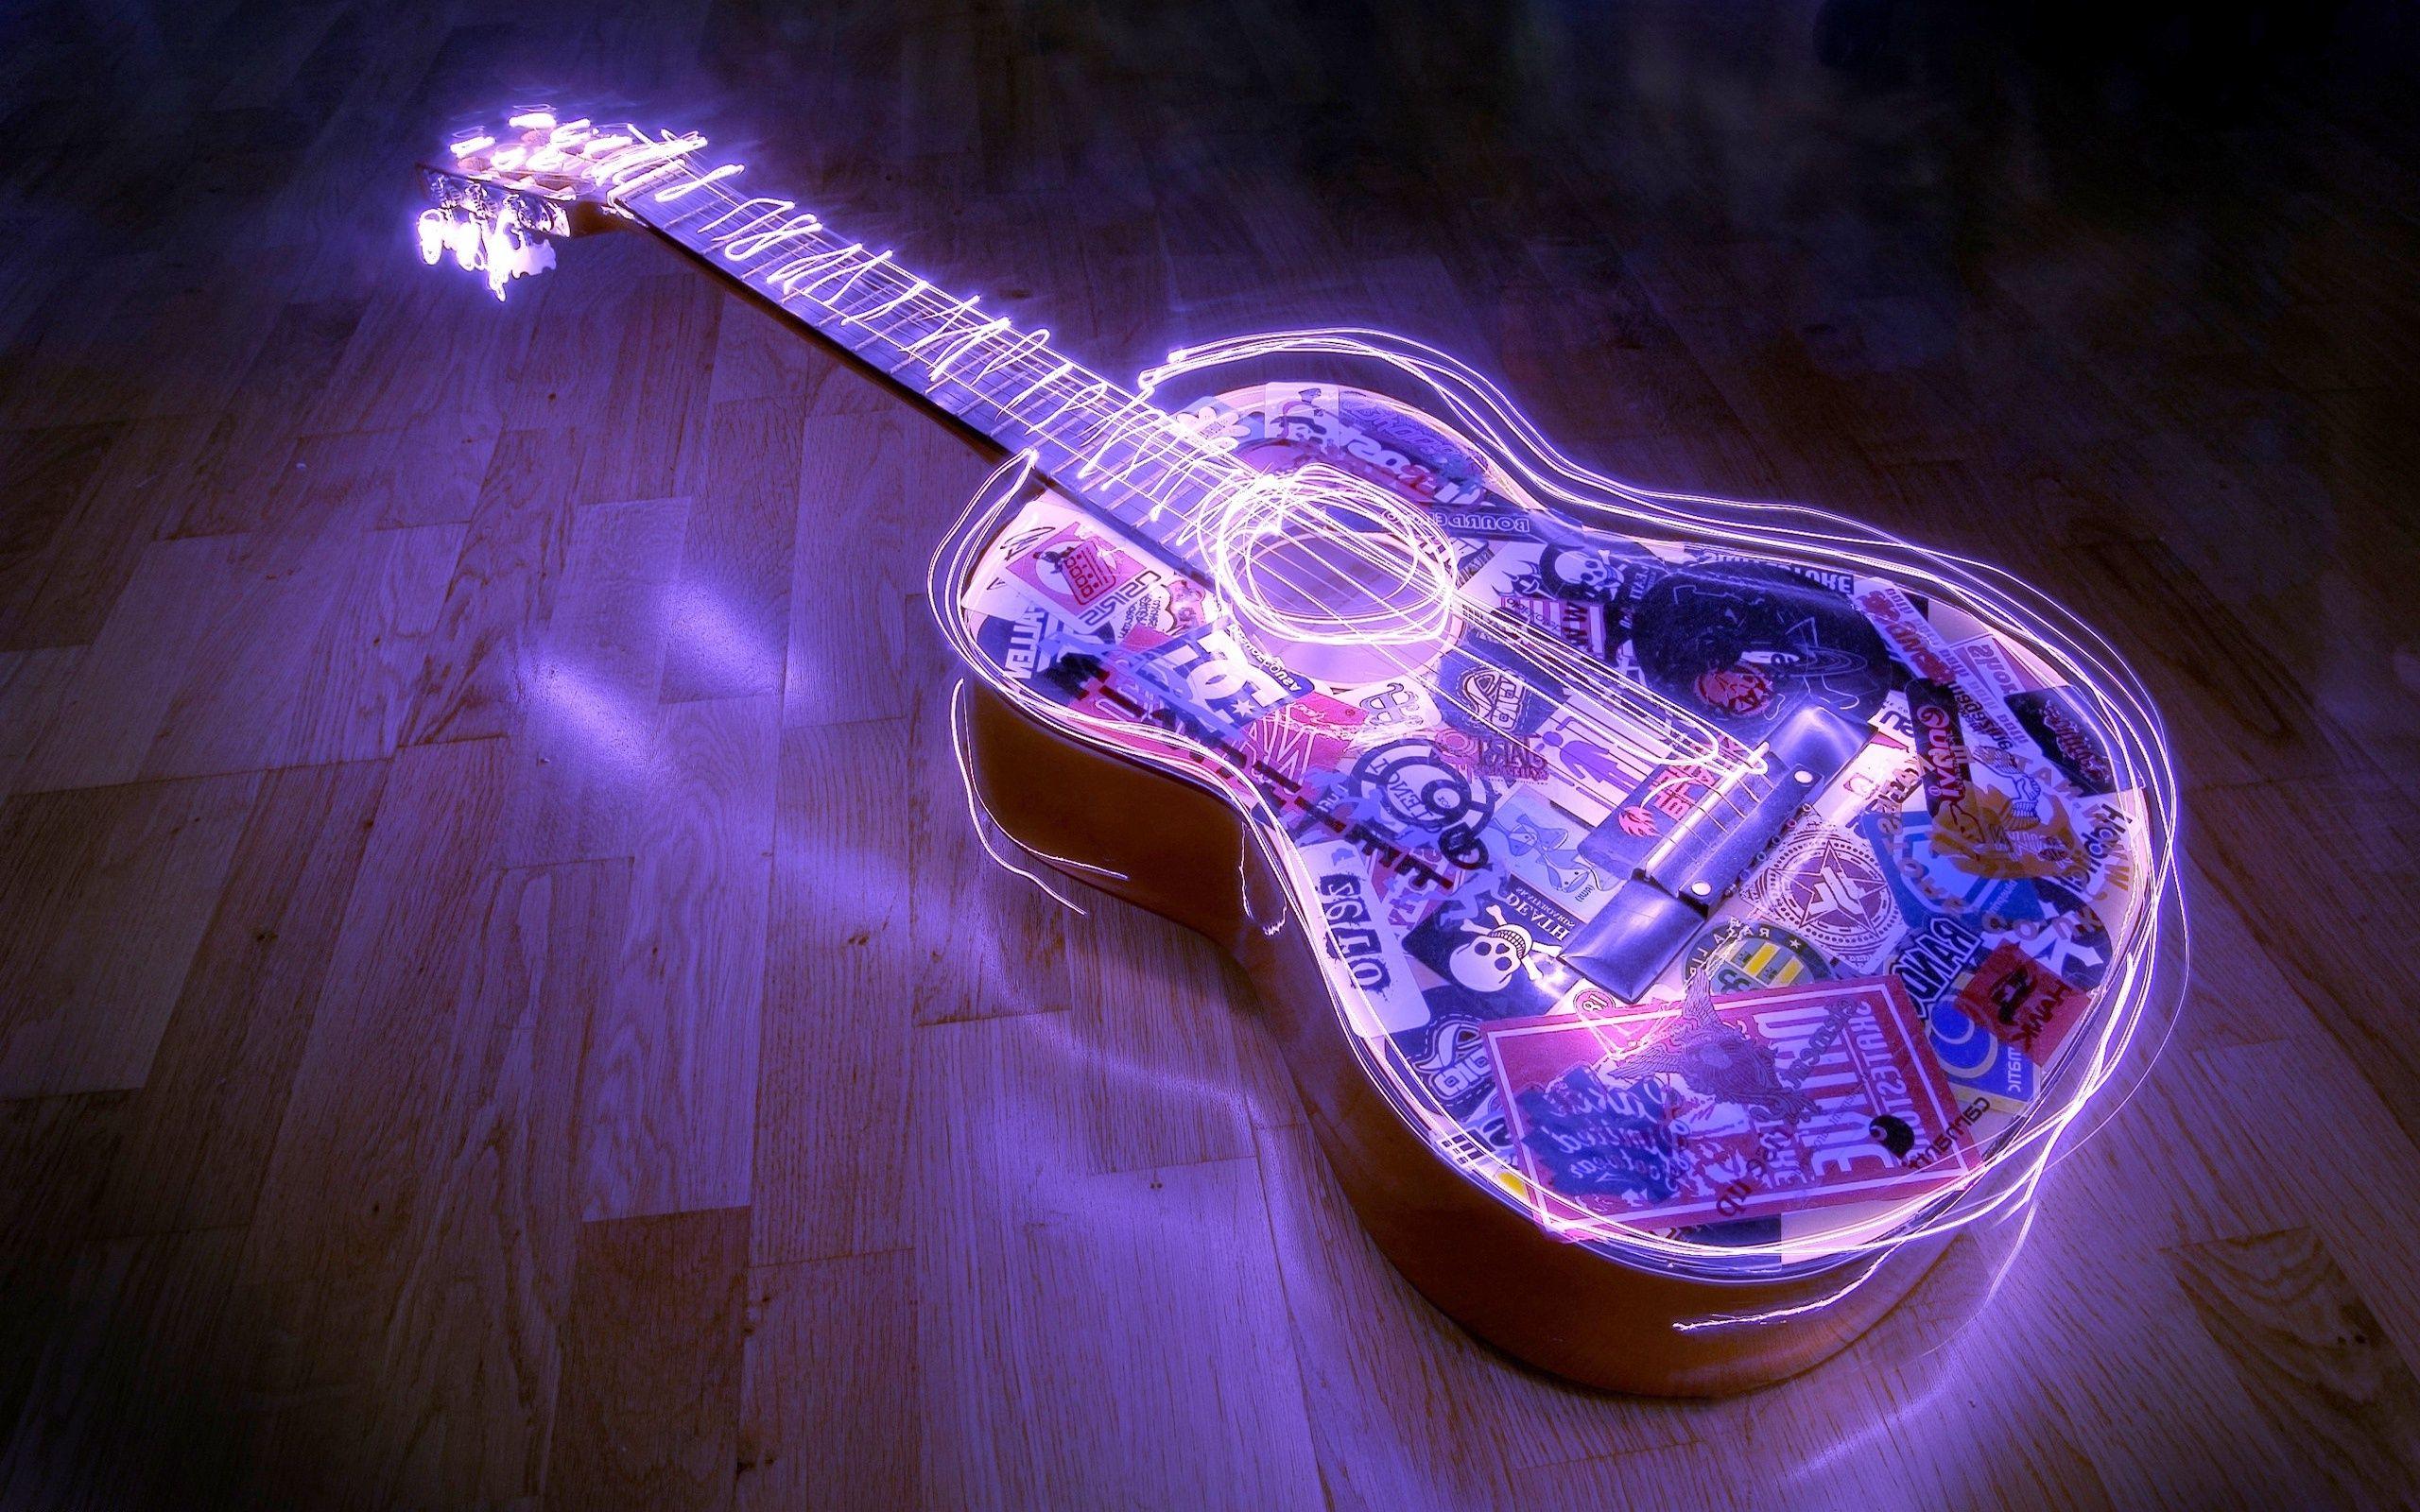 lightsontheguitarwallpaper1.jpg (2560×1600) Fondos